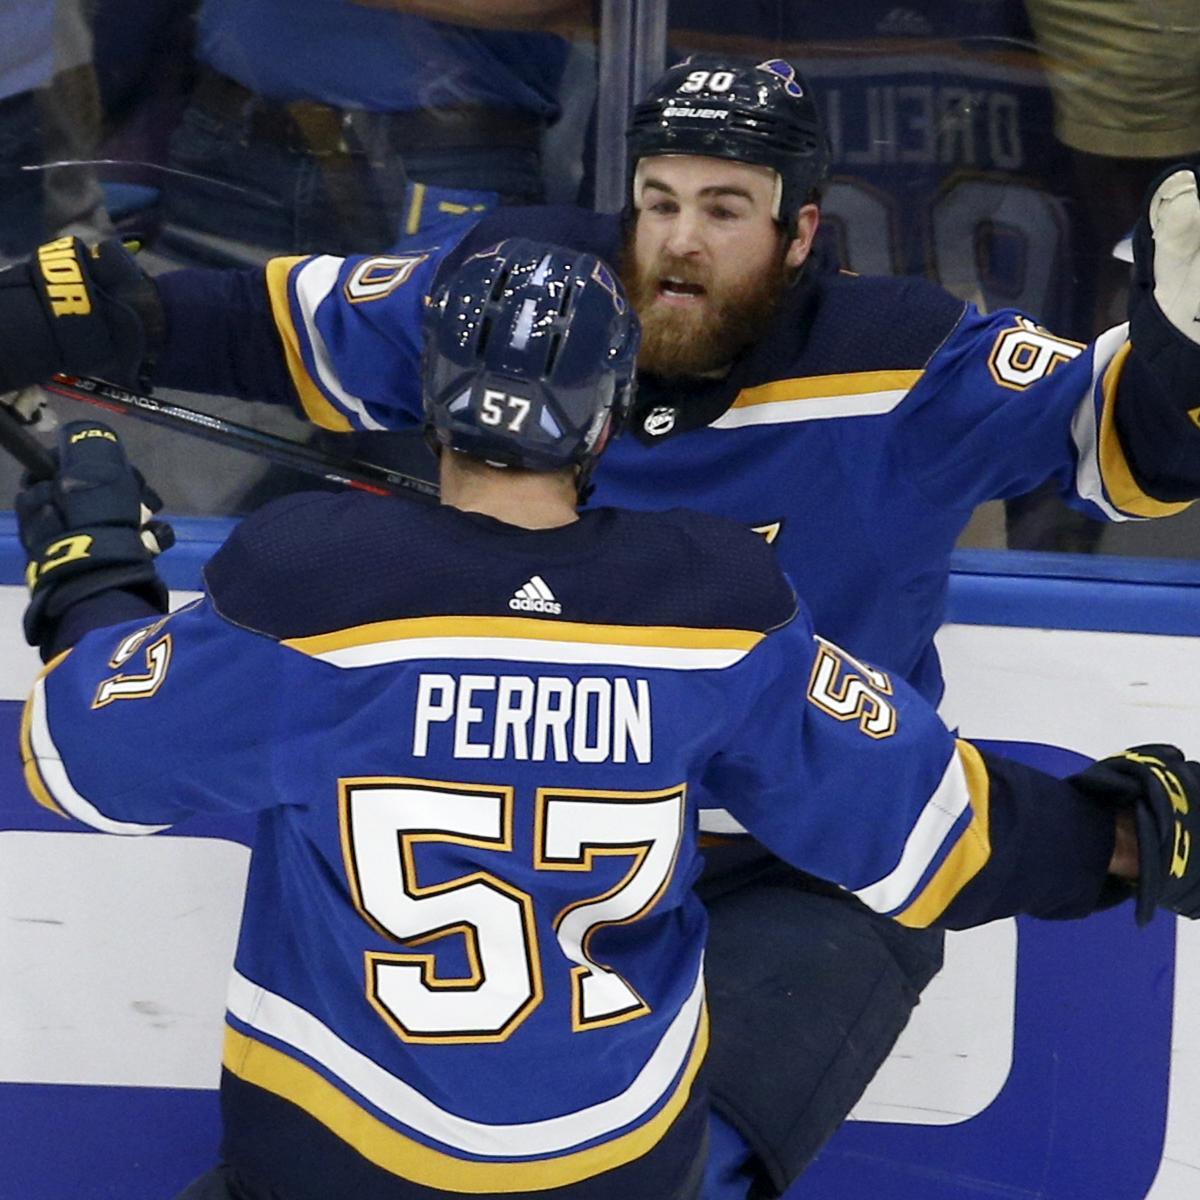 NHL Stanley Cup Final 2019: Bruins Vs. Blues Game 4 Result